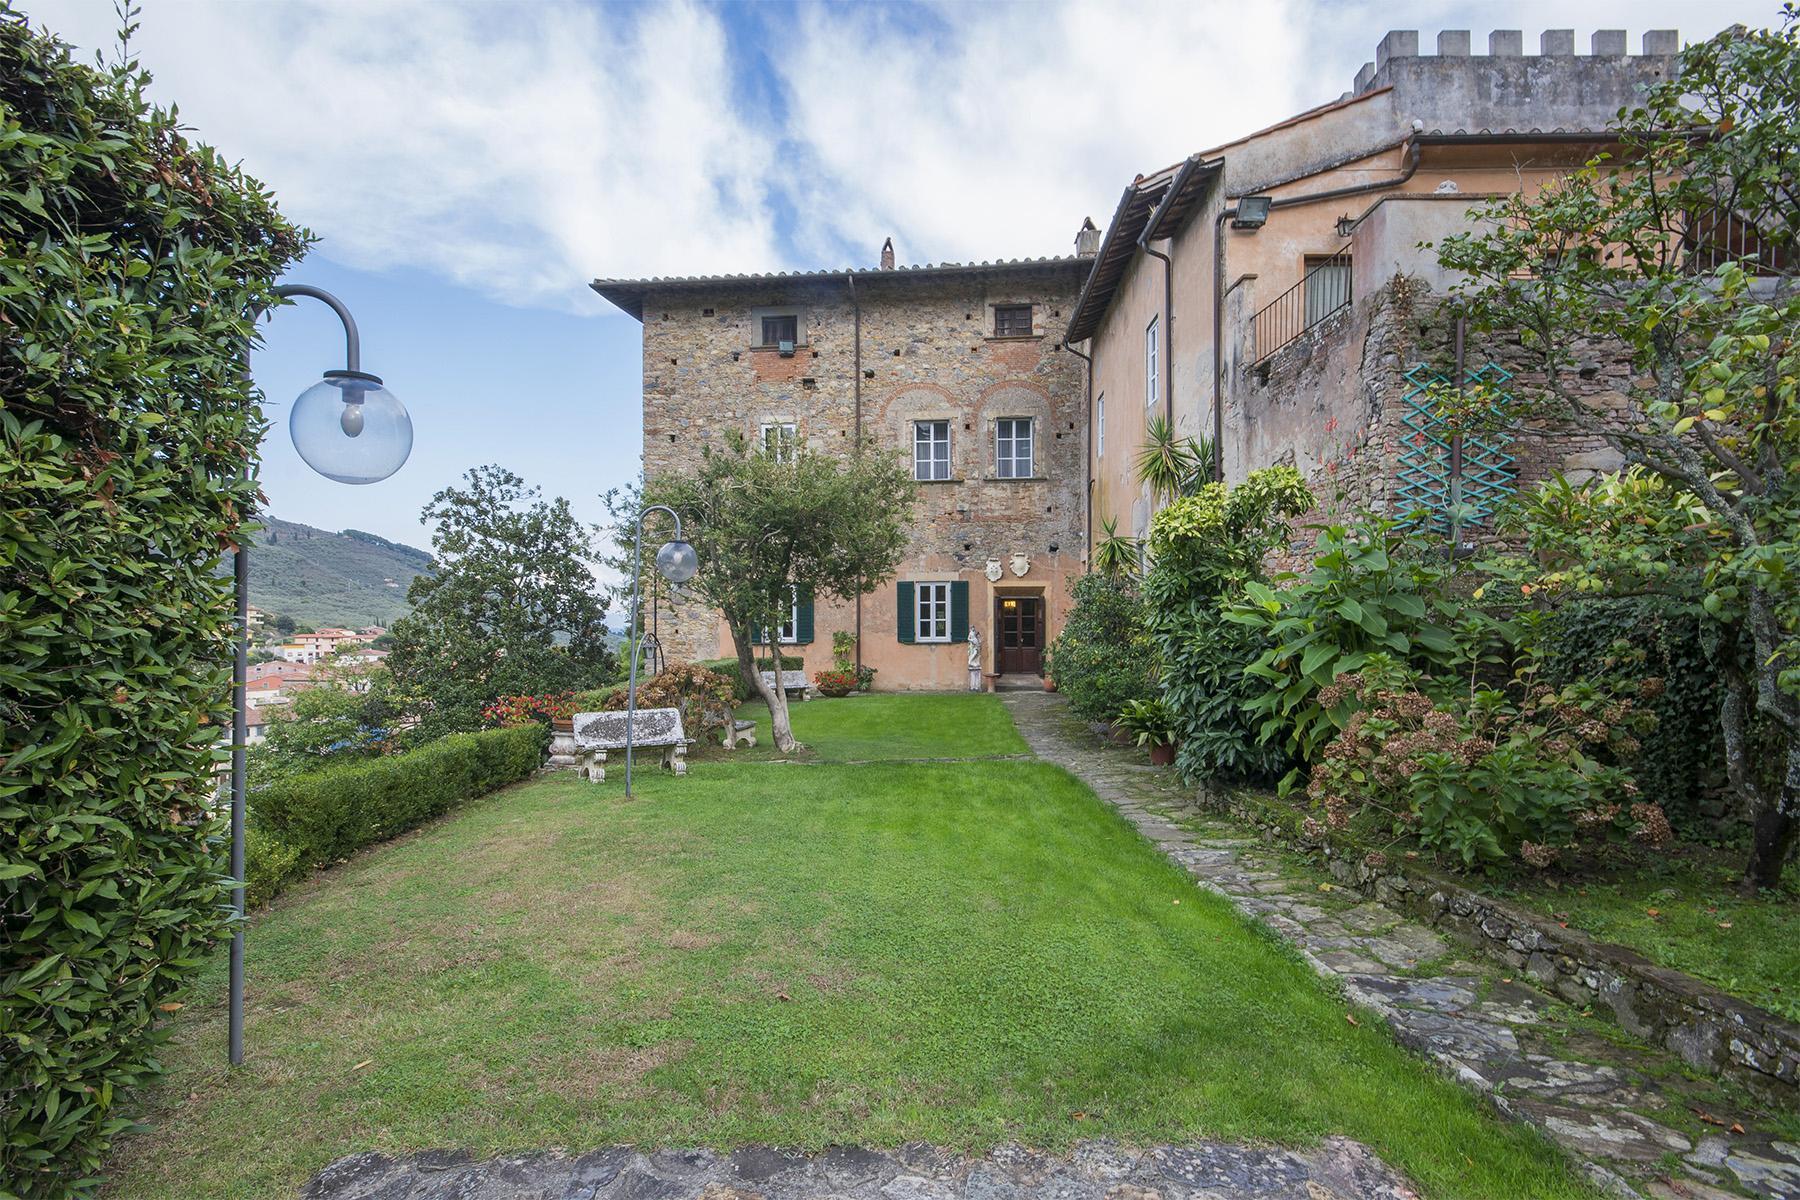 Wonderful Medicean Villa on the Pisan hills - 1